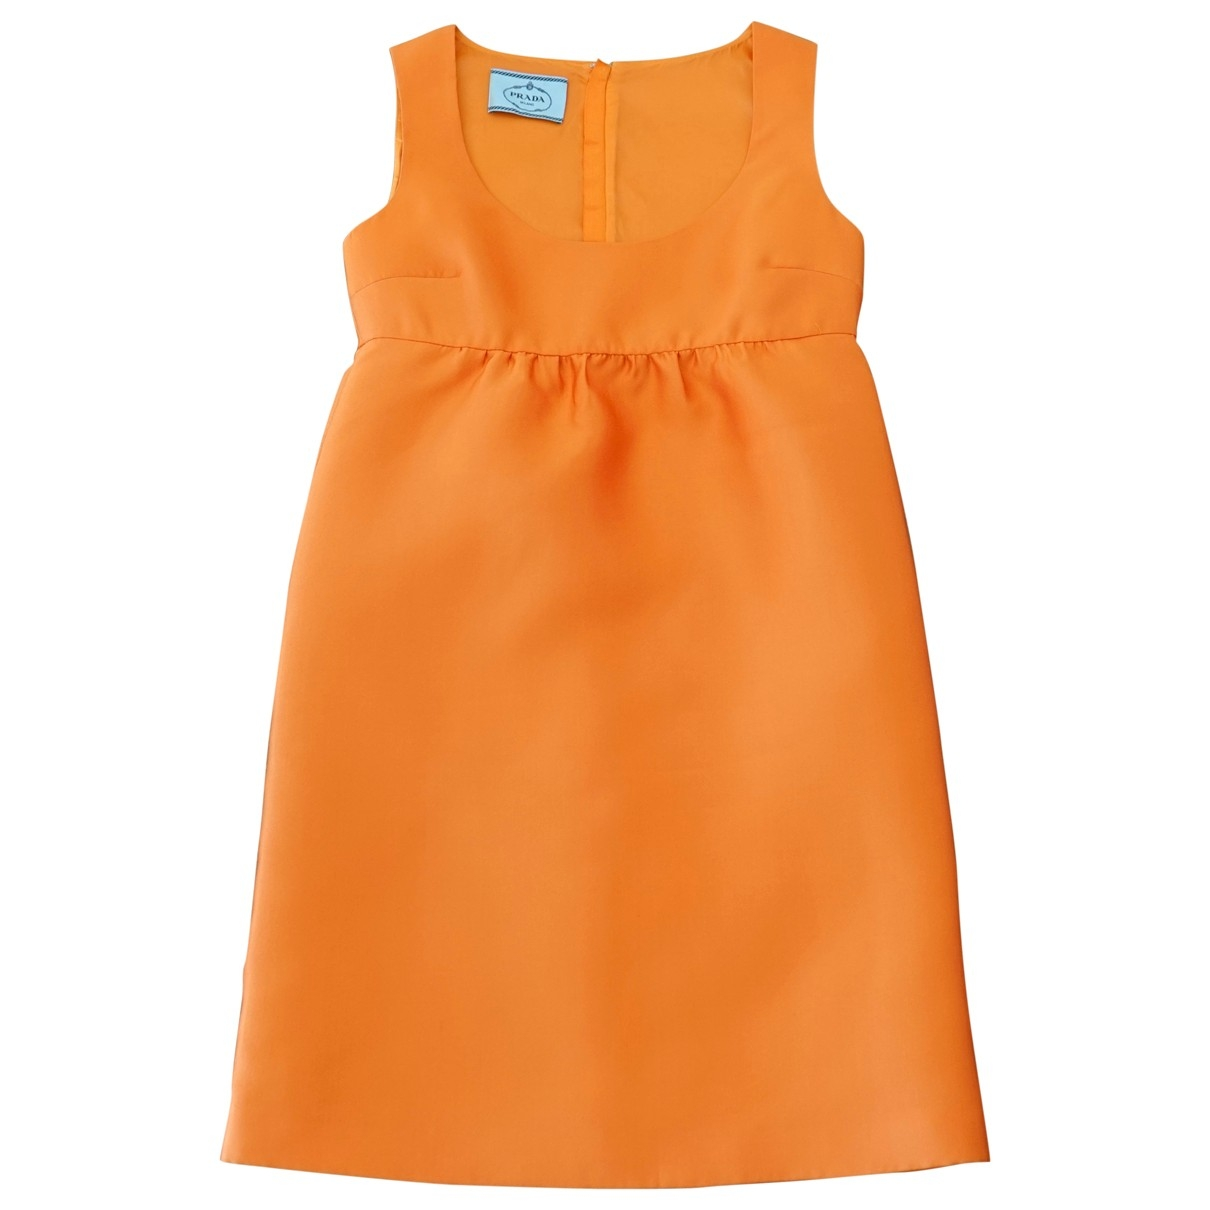 Prada \N Orange dress for Women 42 IT